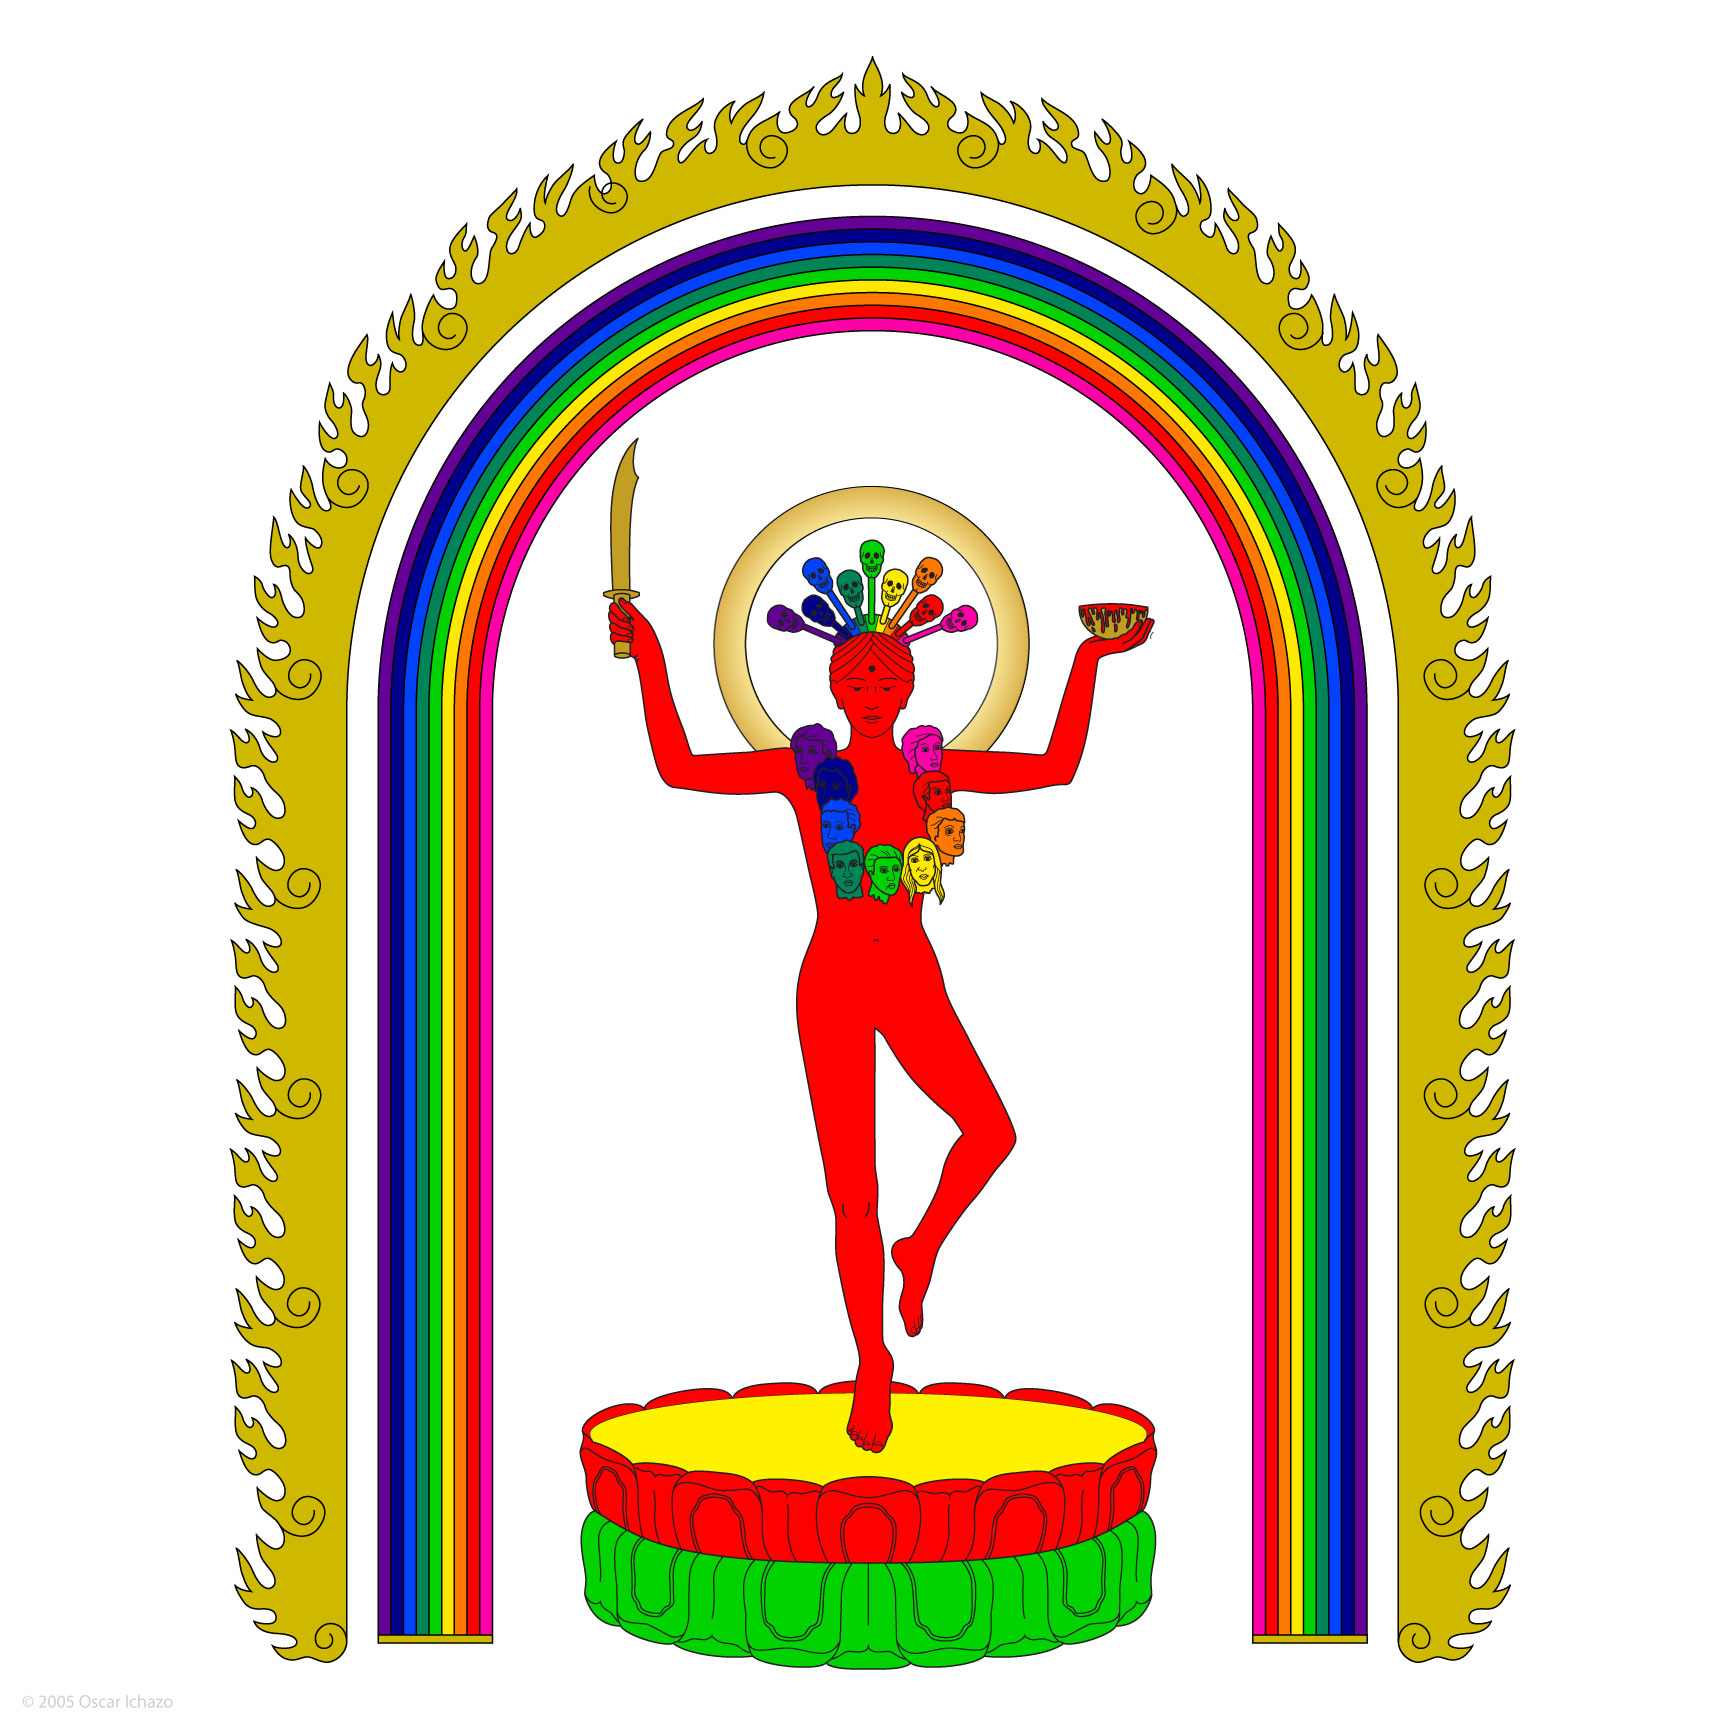 Alpha Heat Ritual Meditations and Contemplation™